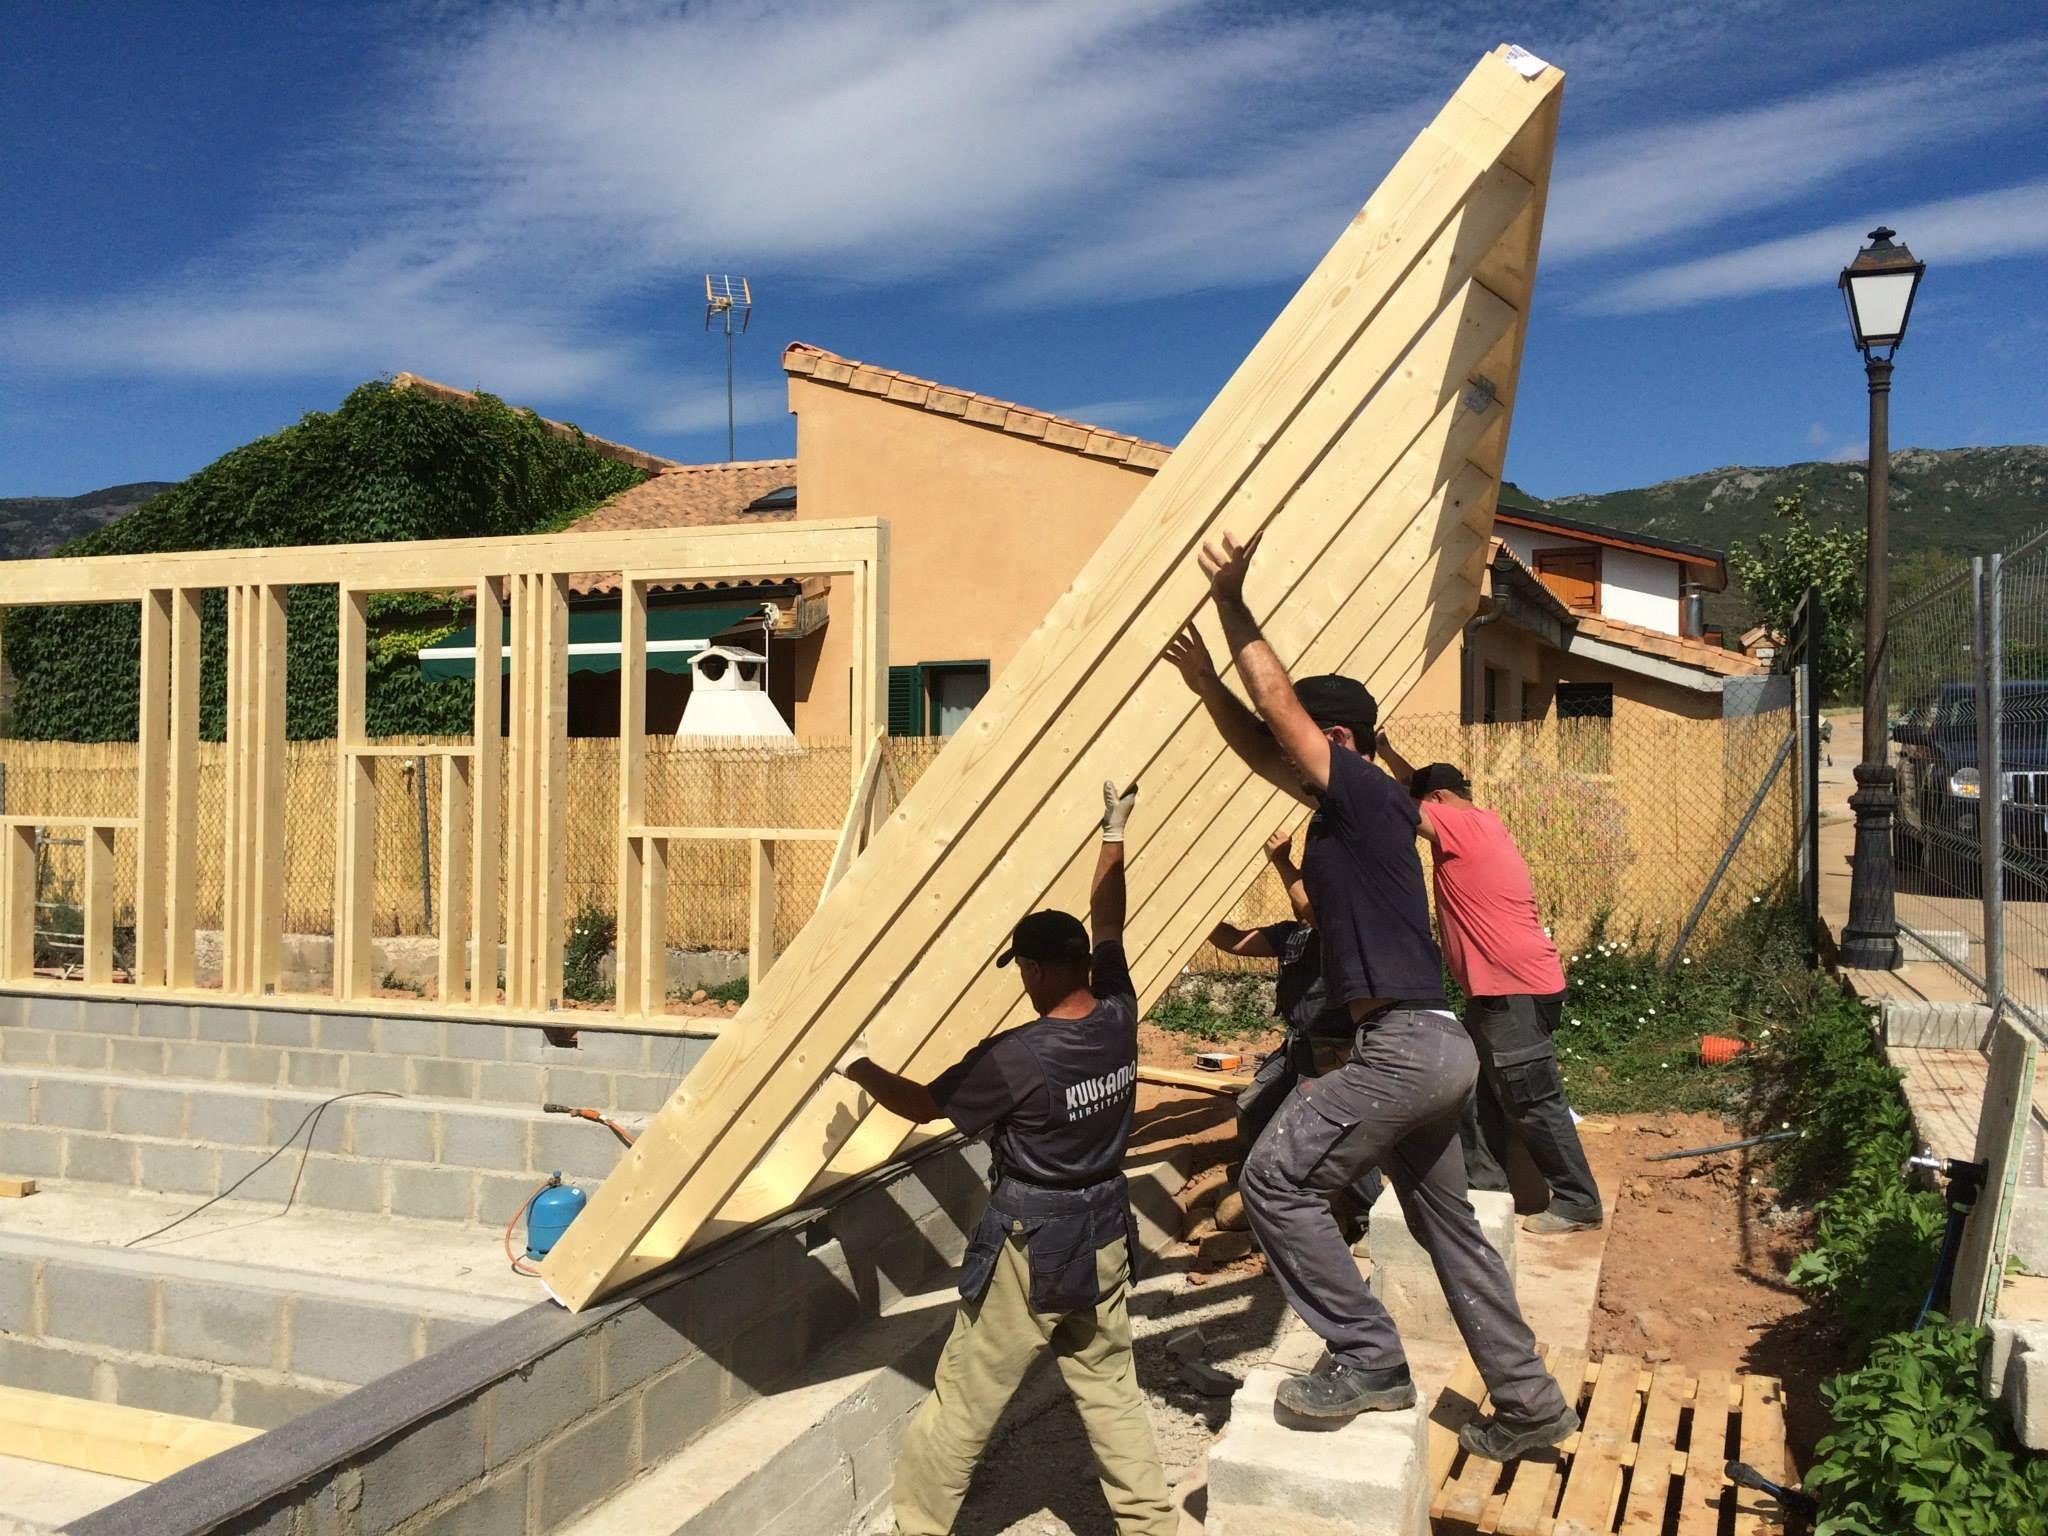 Izando muro de fachada casa con estructura de madera - Estructura casa de madera ...